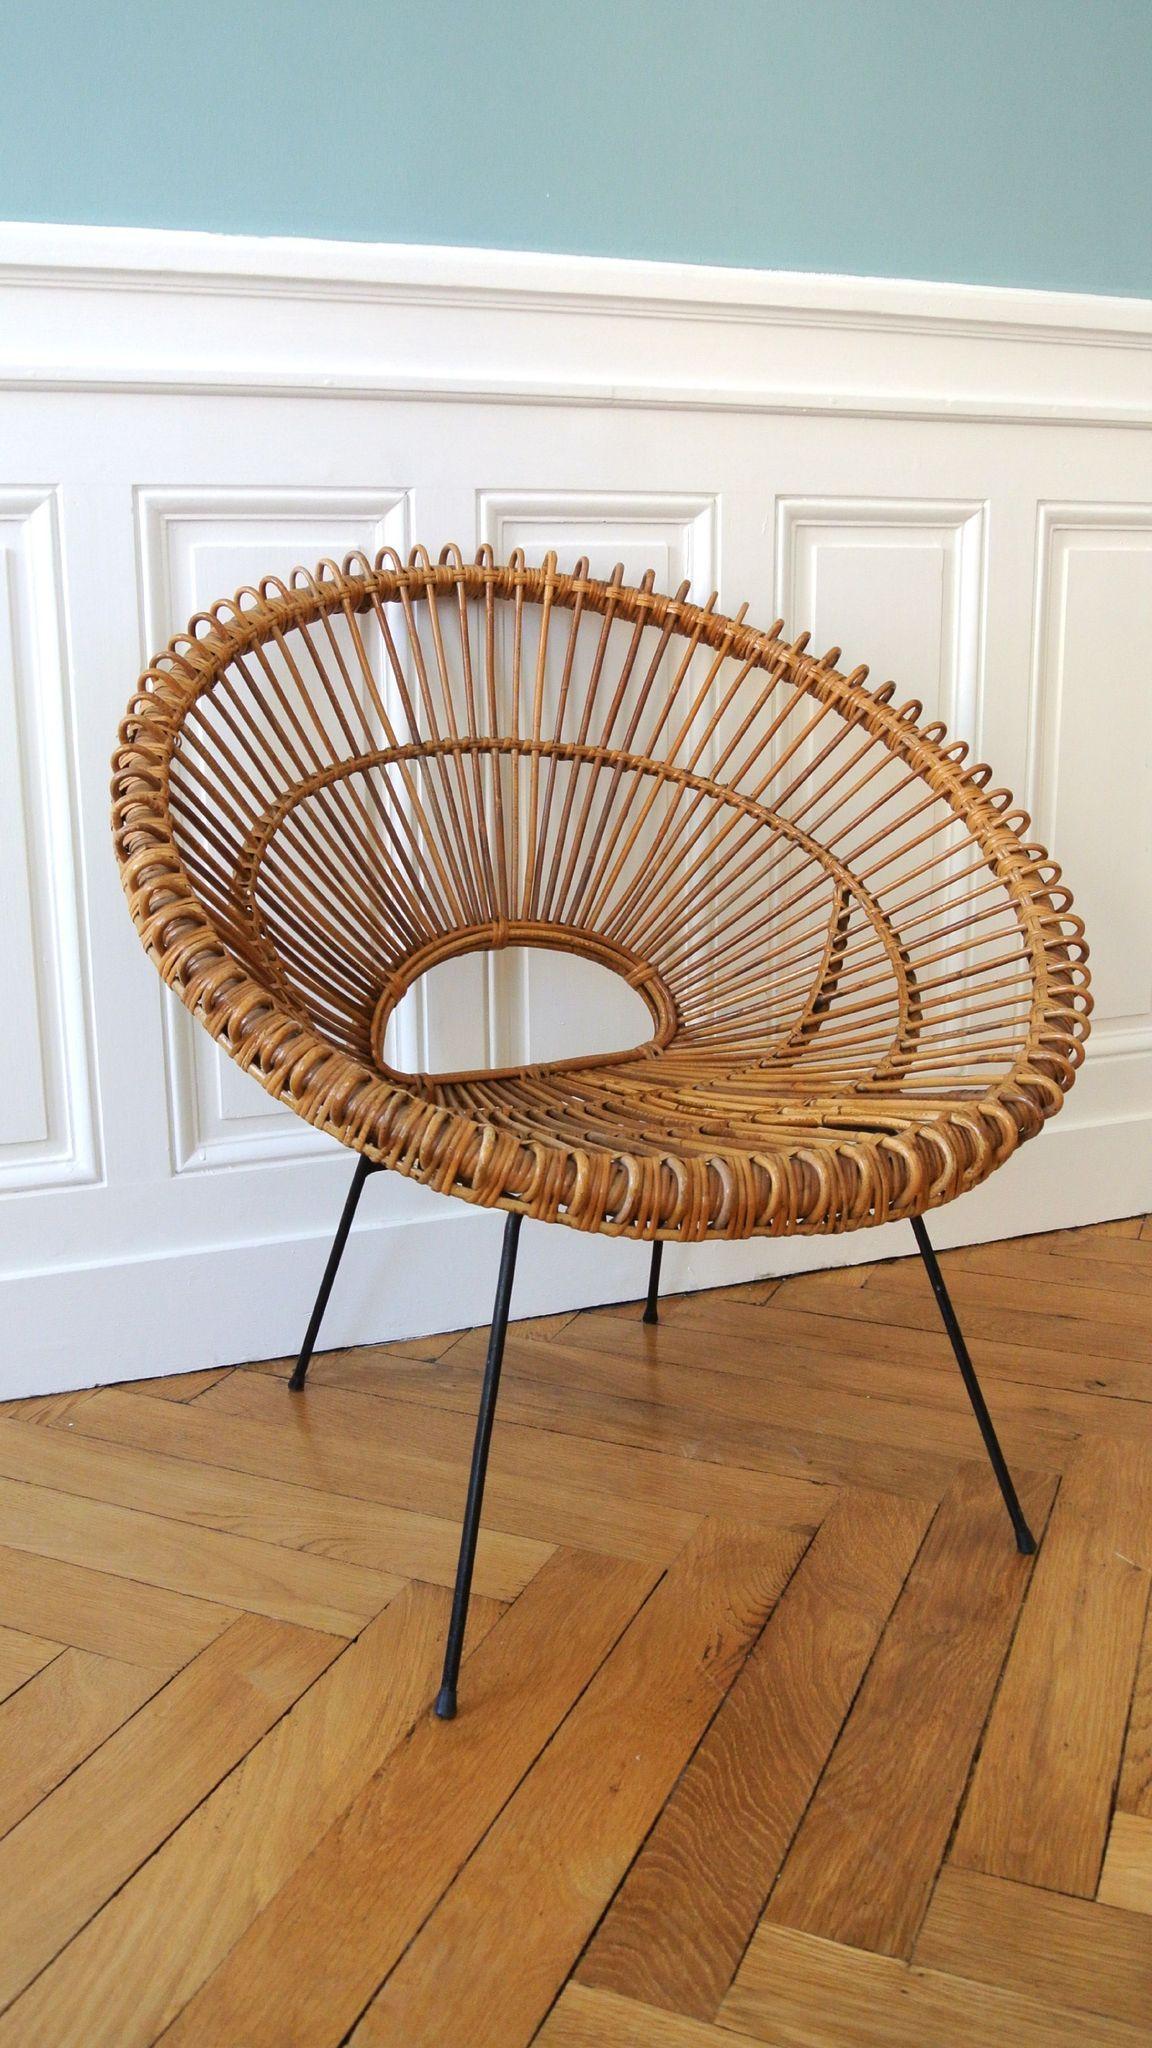 fauteuil en rotin des ann es 50 janine abraham solveig vintage galerie muebles bamb. Black Bedroom Furniture Sets. Home Design Ideas